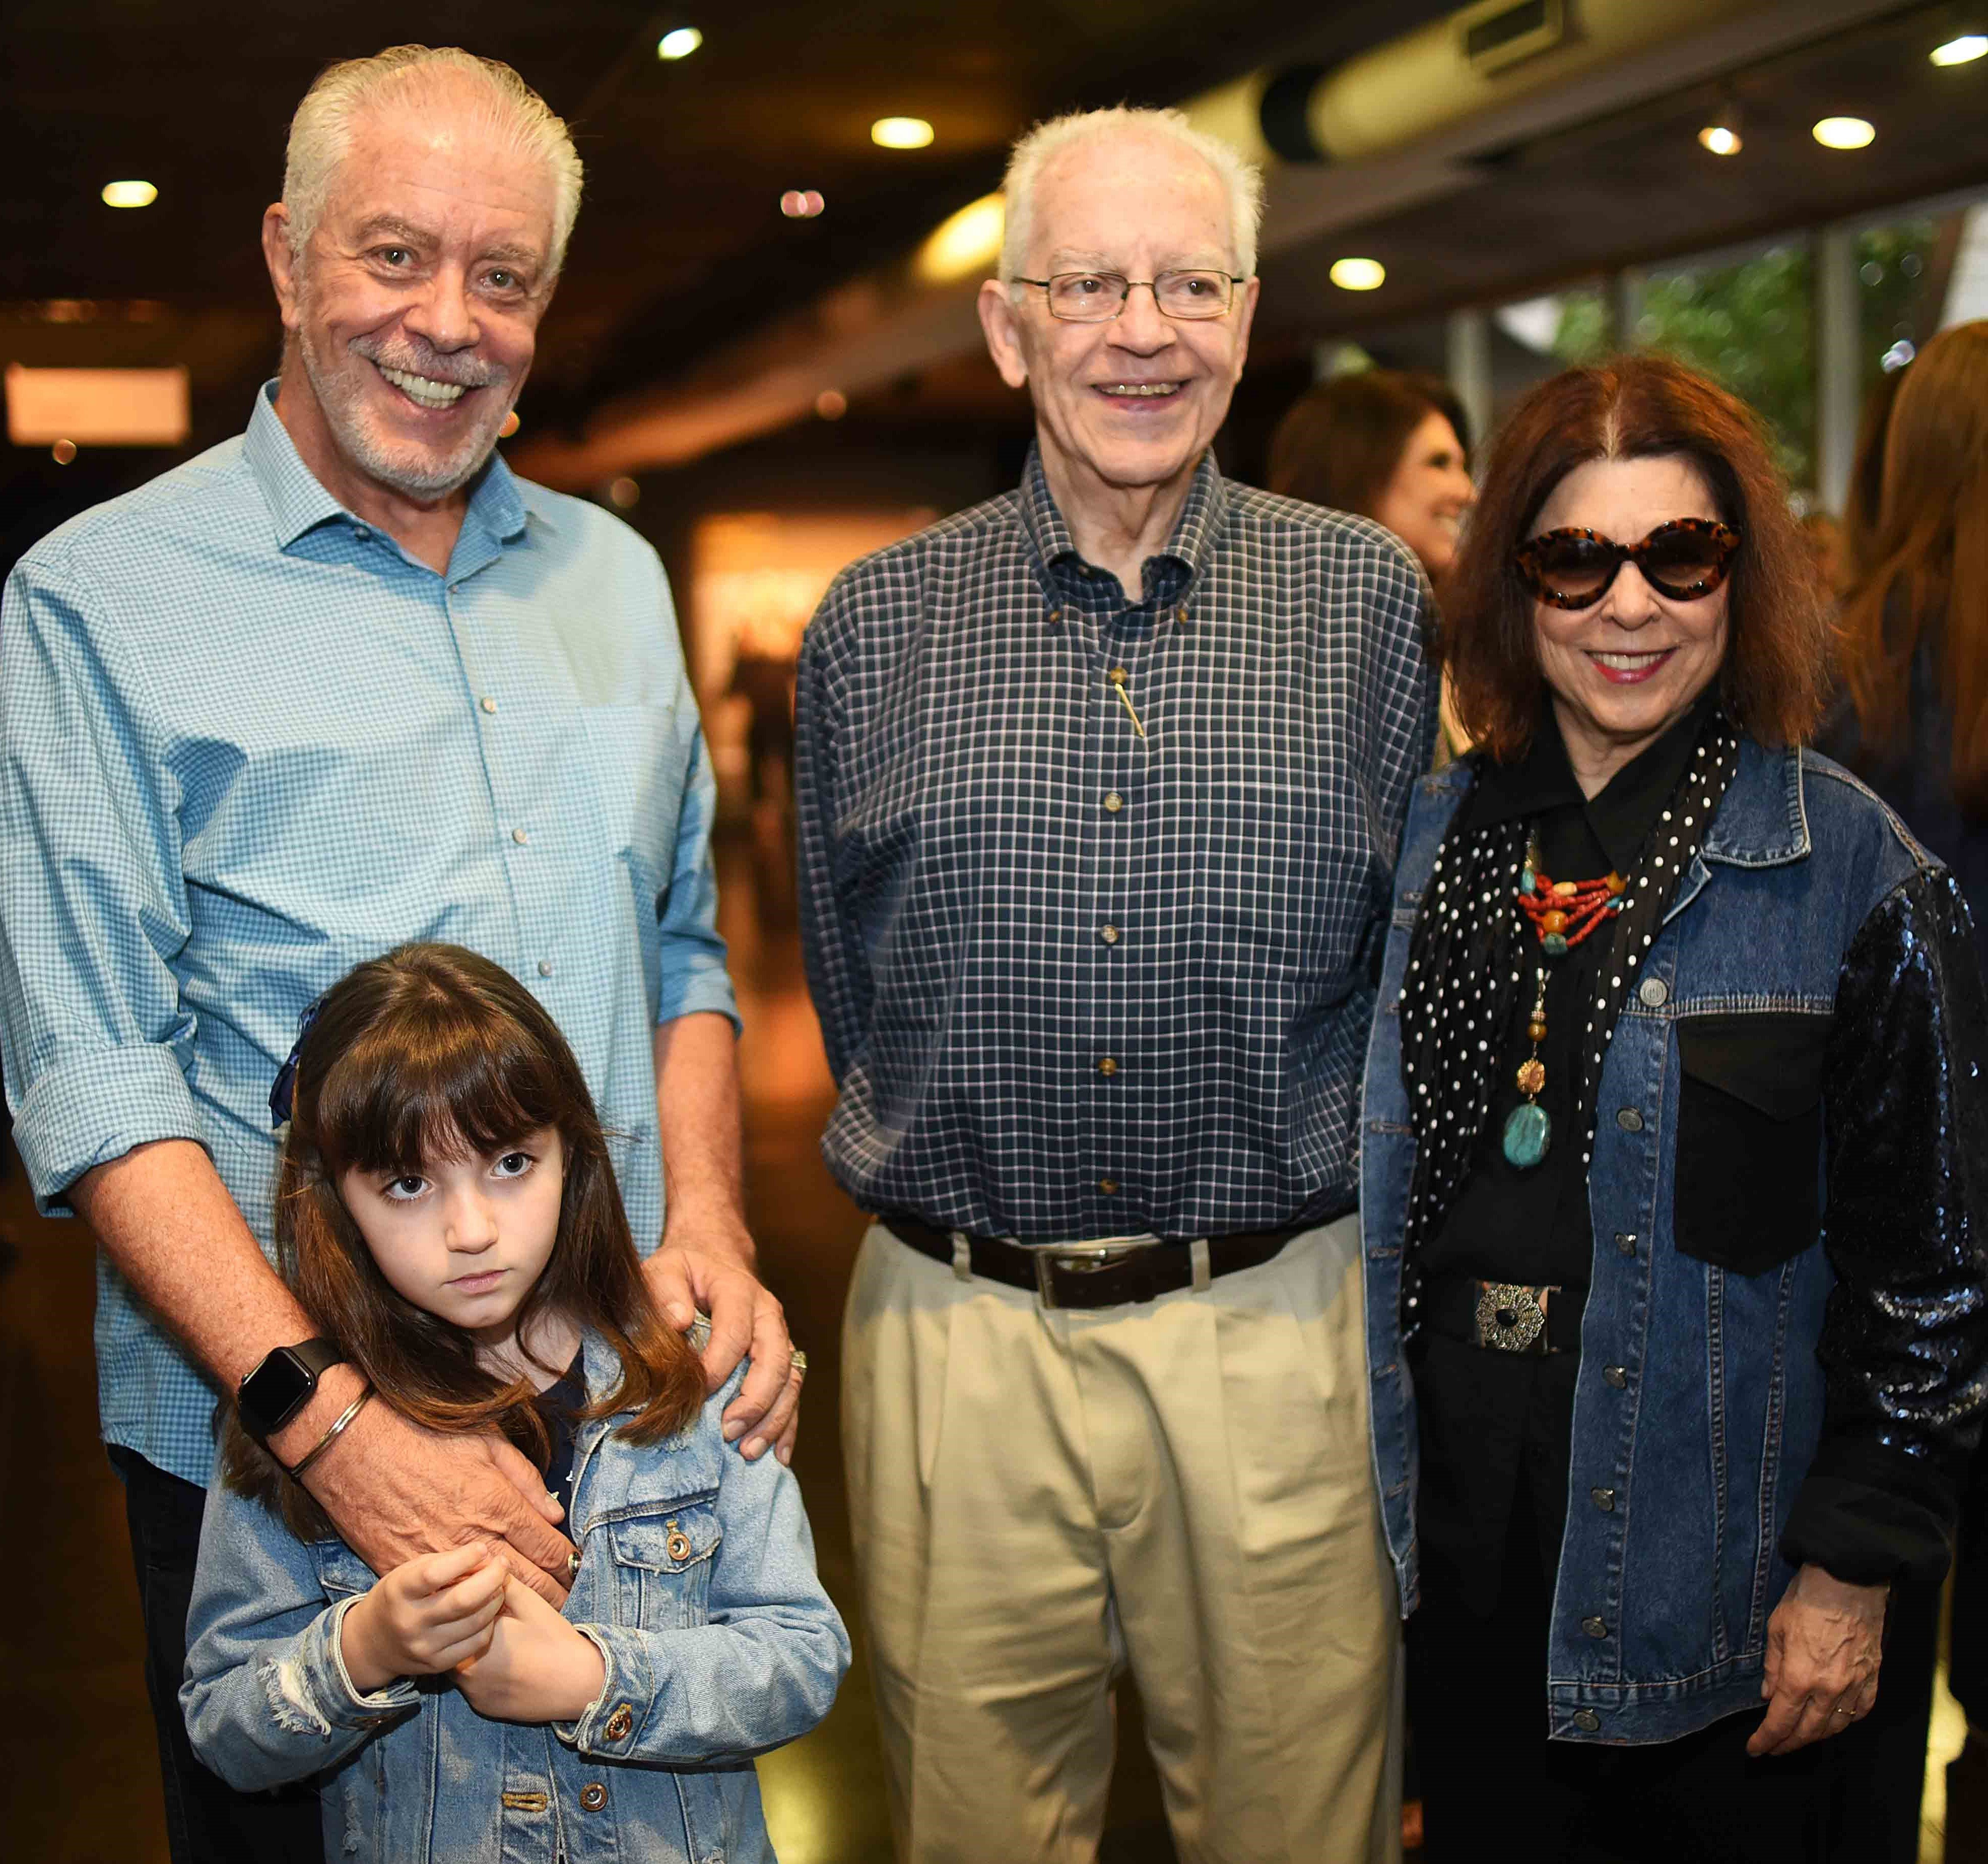 Antonio Bernardo com a filha, Gabriela Hermann, Paulo Bertazzi e Vanda Klabin /Foto: Ari Kaye